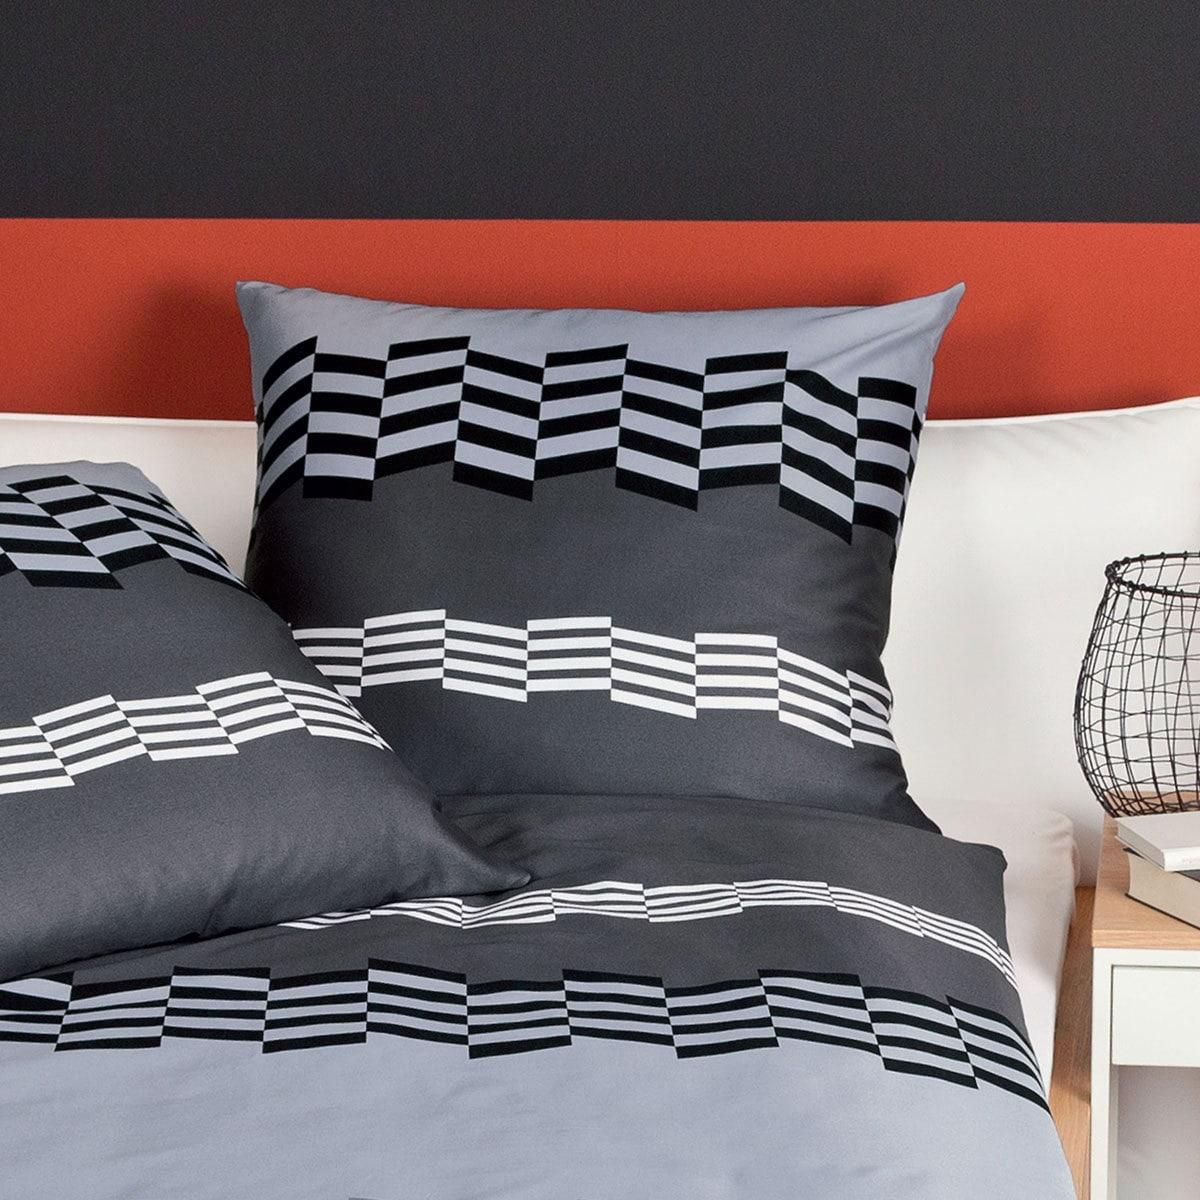 janine mako satin bettw sche j d 87011 08 titan g nstig online kaufen bei bettwaren shop. Black Bedroom Furniture Sets. Home Design Ideas